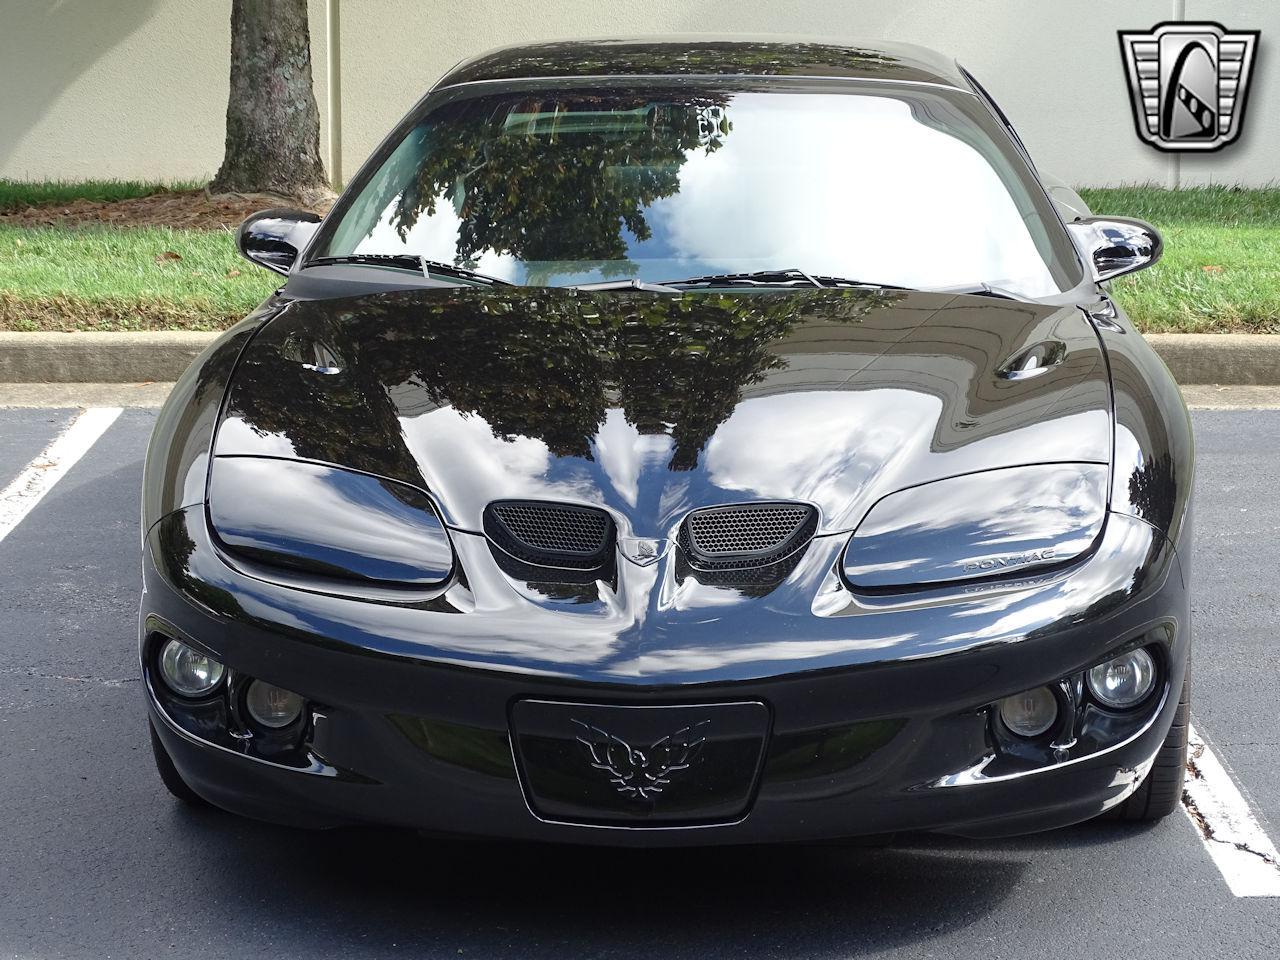 2001 Pontiac Firebird 21